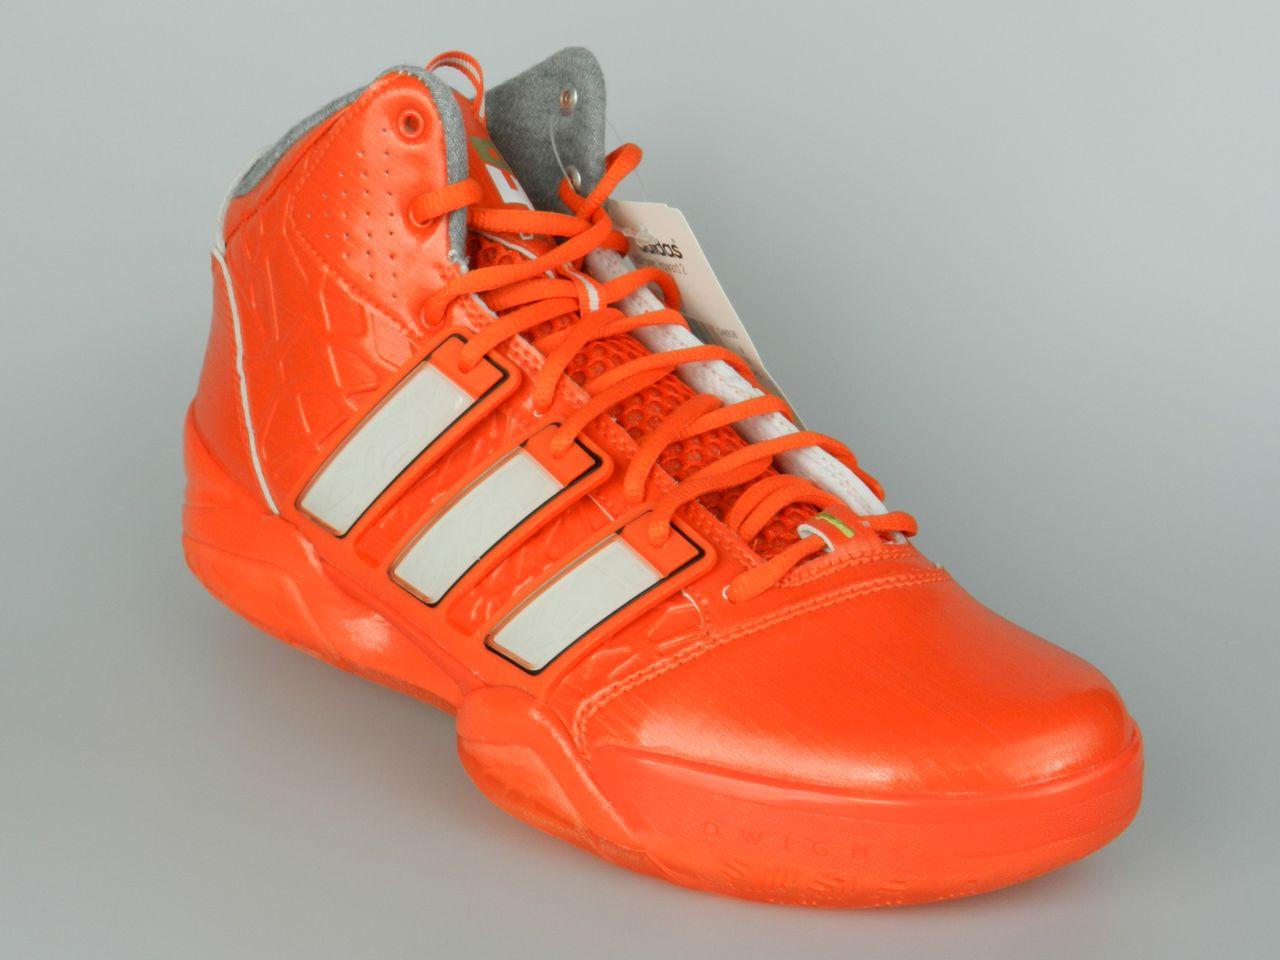 best website 839c7 b54b9 ADIDAS ADIPOWER HOWARD 2 ALL STAR NEW Mens Dwight Howard Orange Shoes G48898